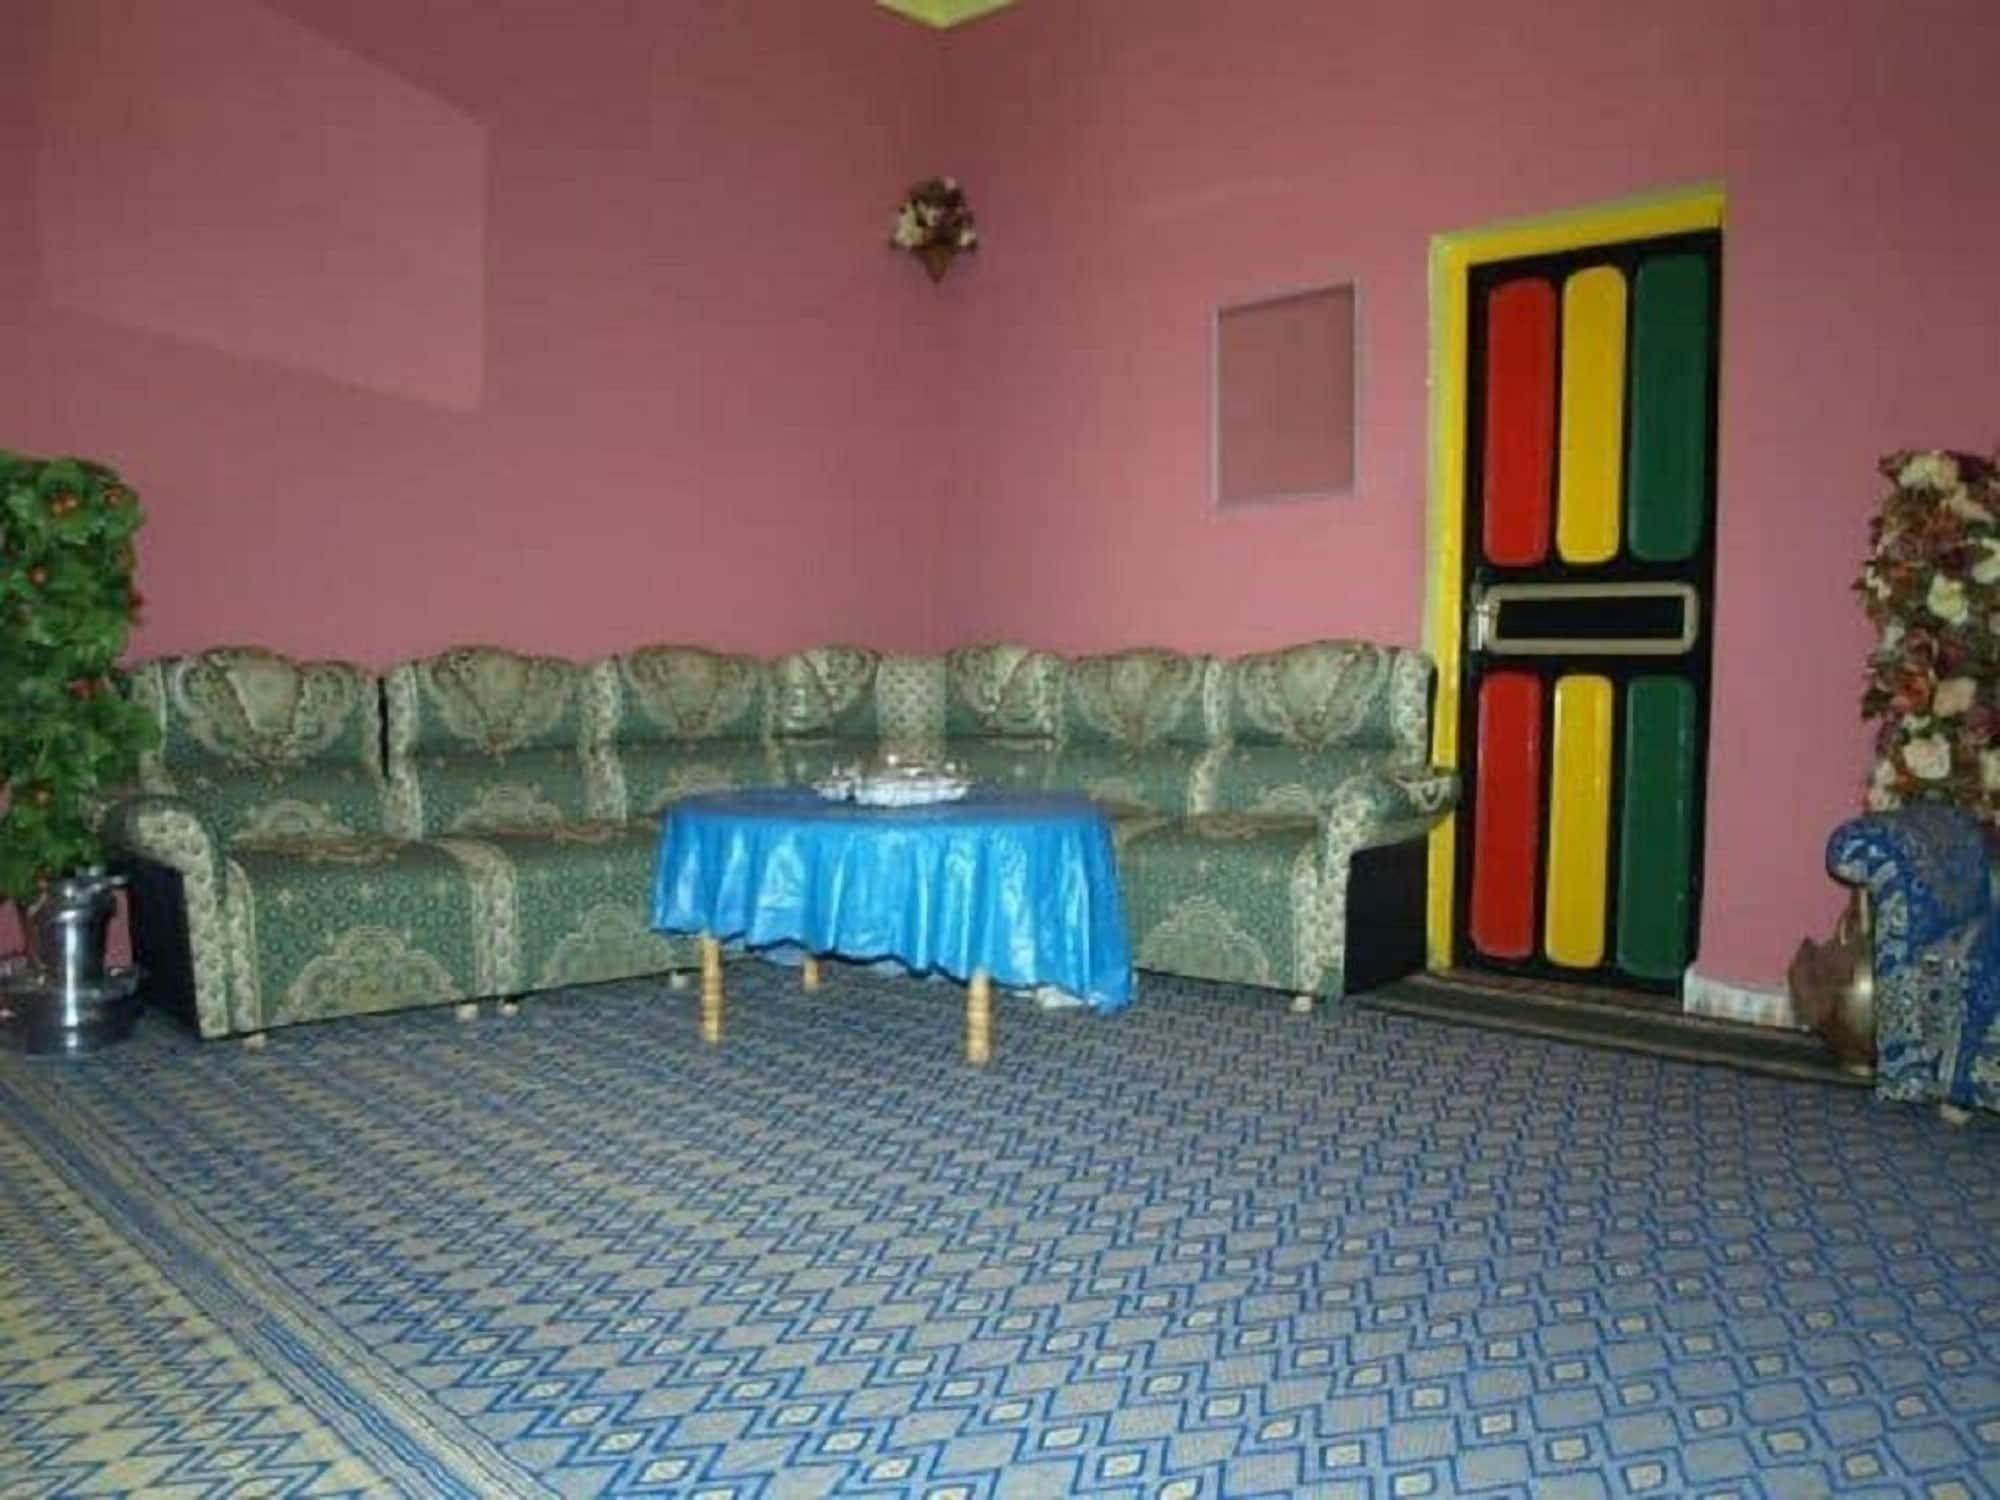 Maison D'hotes Ibork, Tiznit